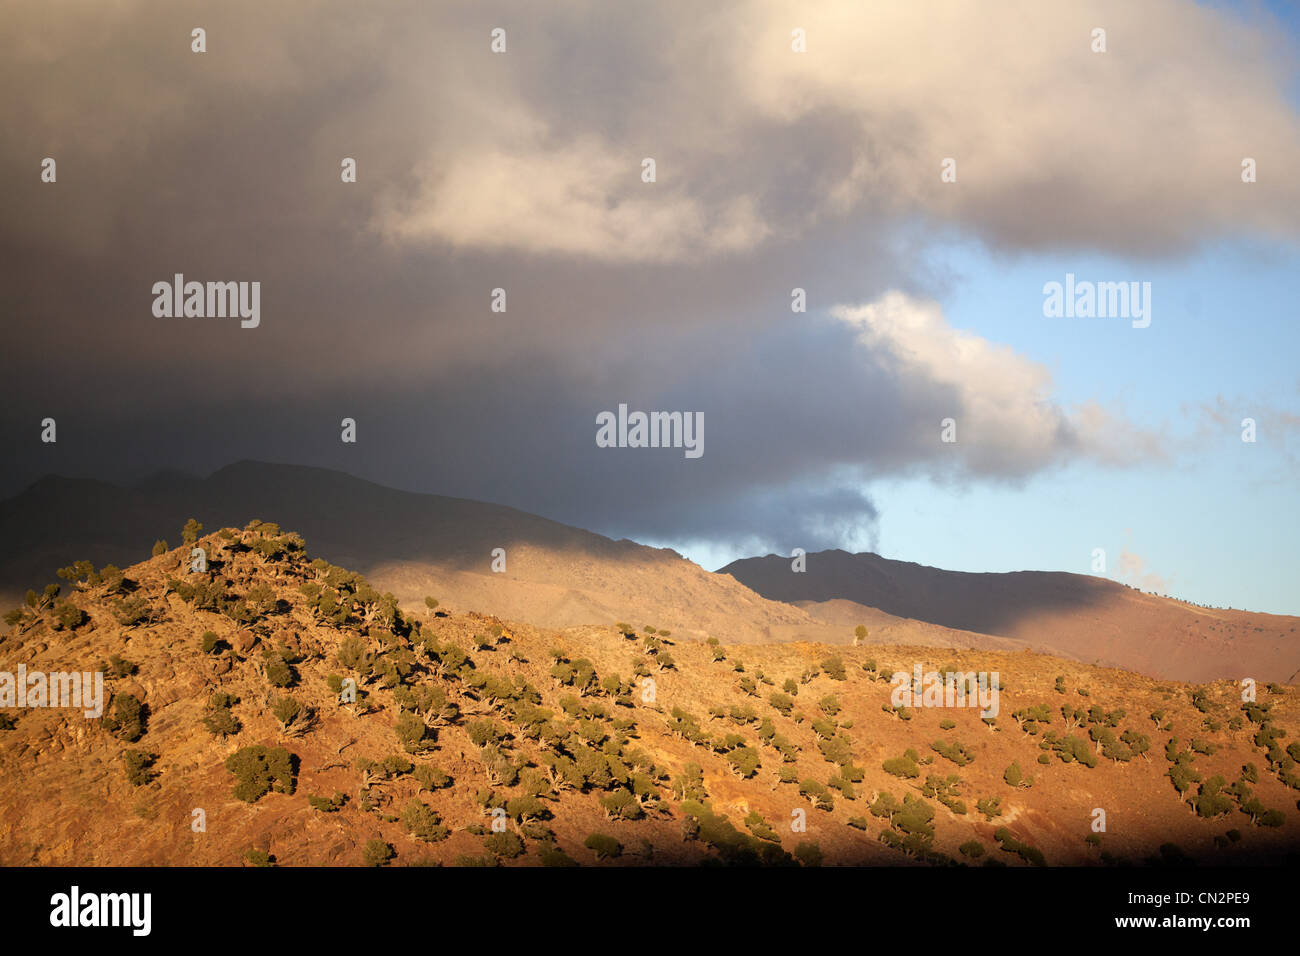 Paisajes de montaña, Marruecos, Norte de África Imagen De Stock